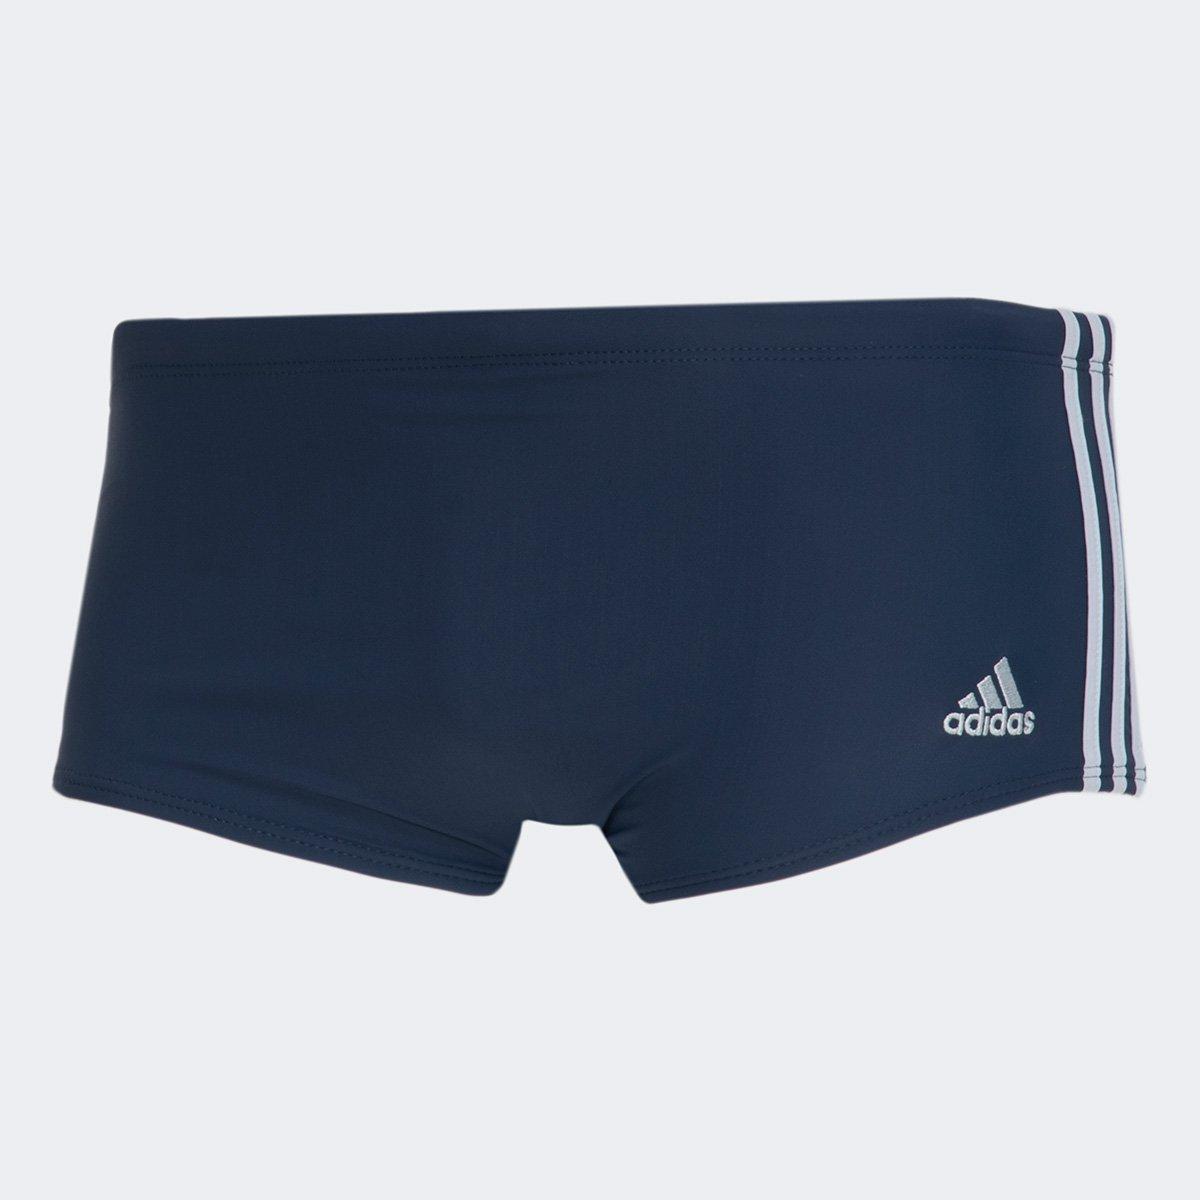 Sunga Adidas 3 Listras Wide